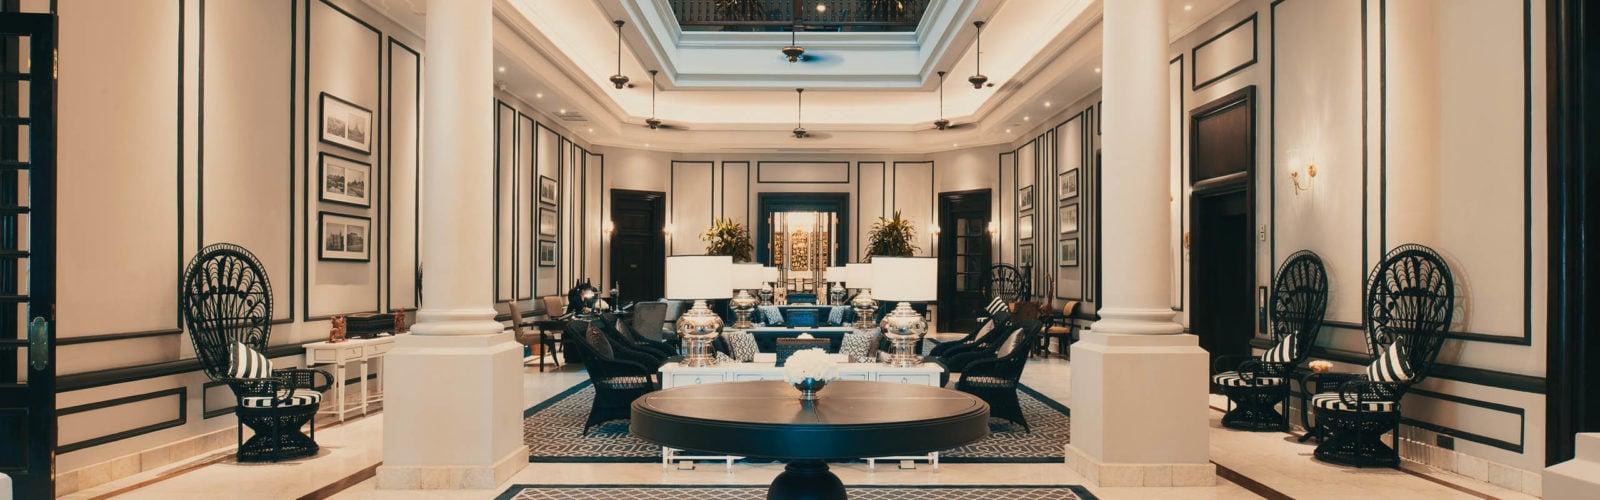 Lobby at the Strand Hotel in Yangon, Myanmar